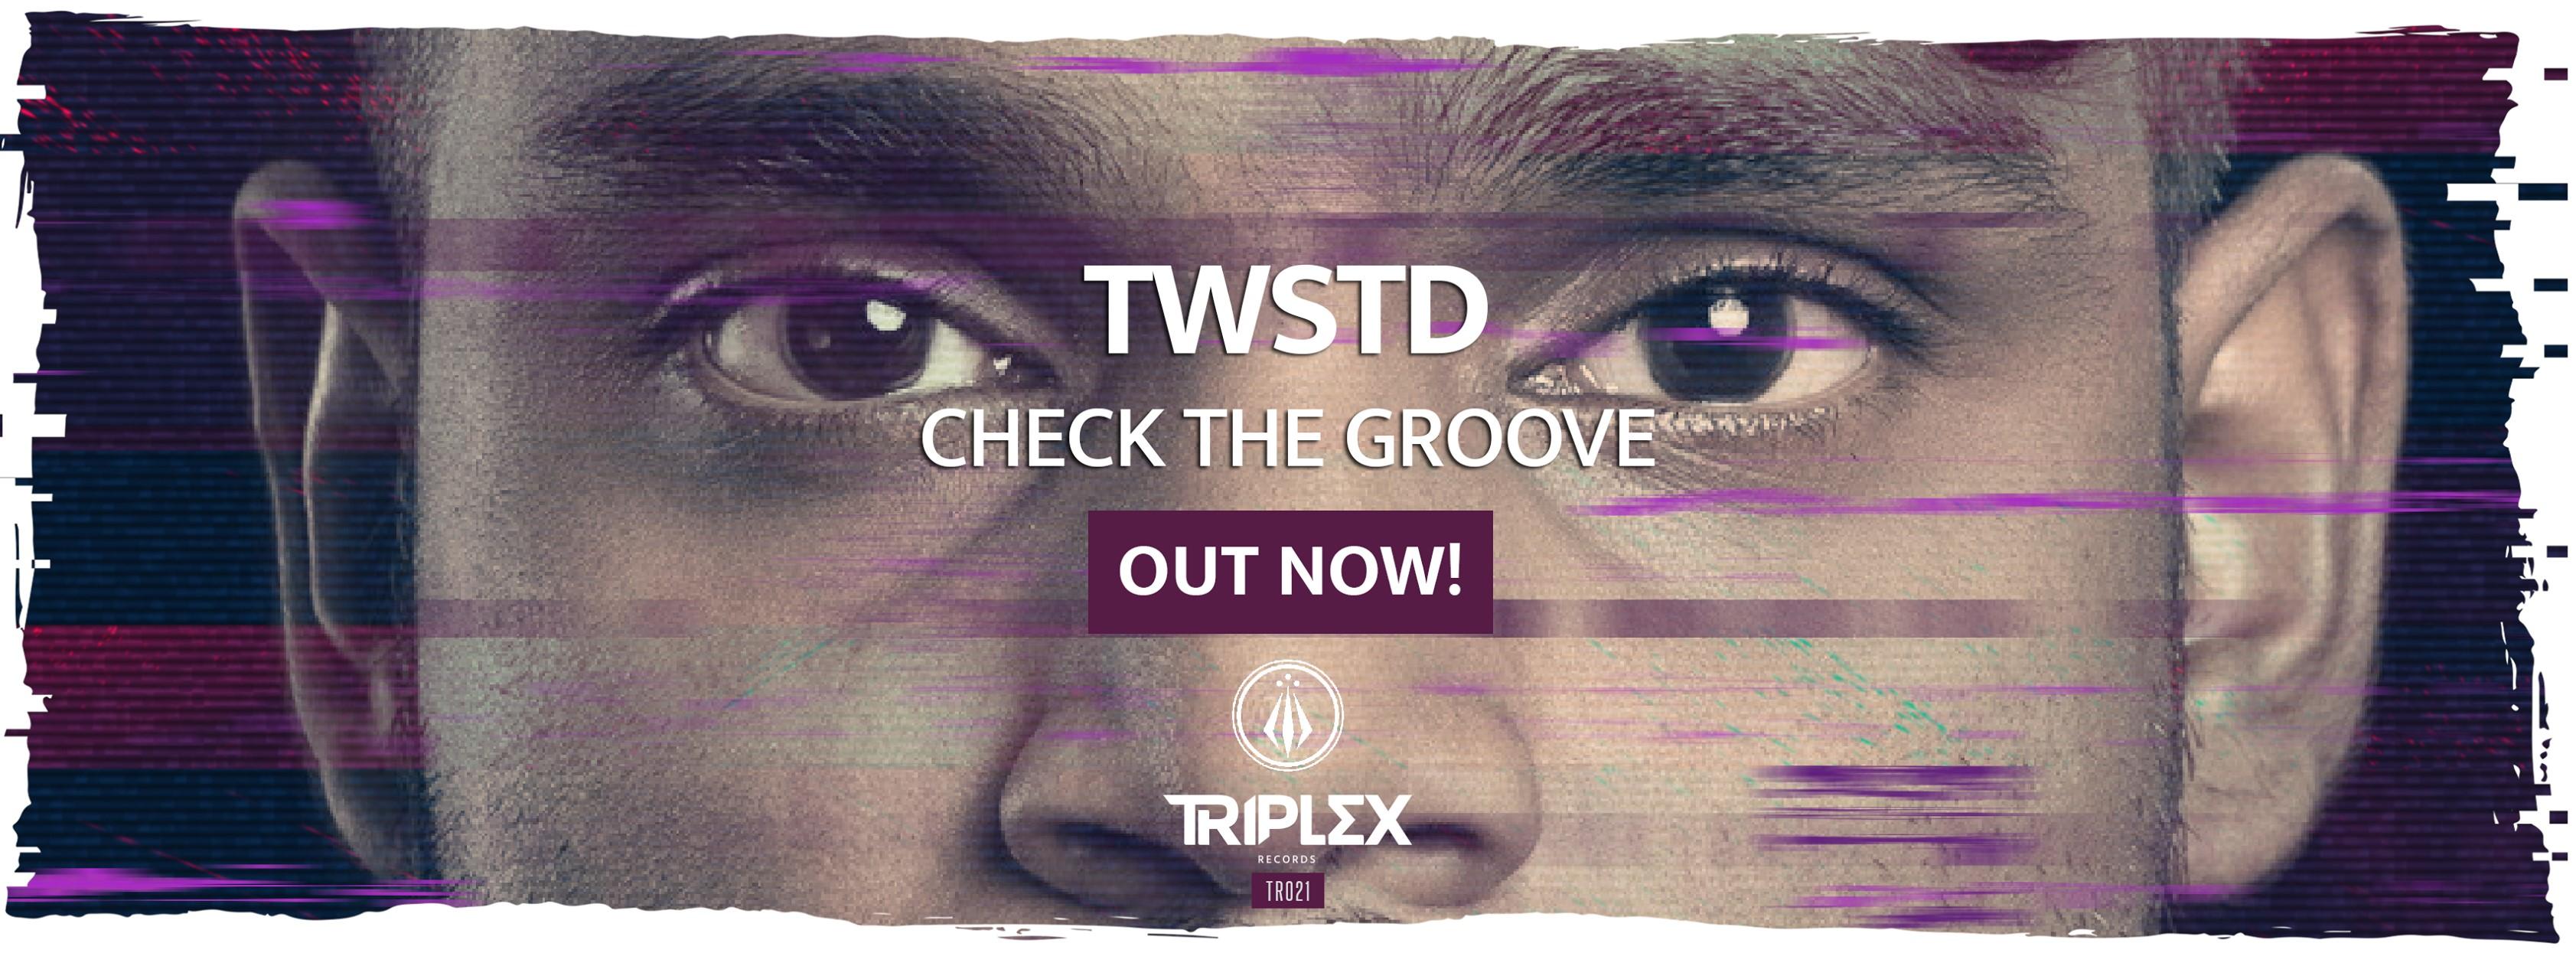 Check The Groove - Radio Edit Image